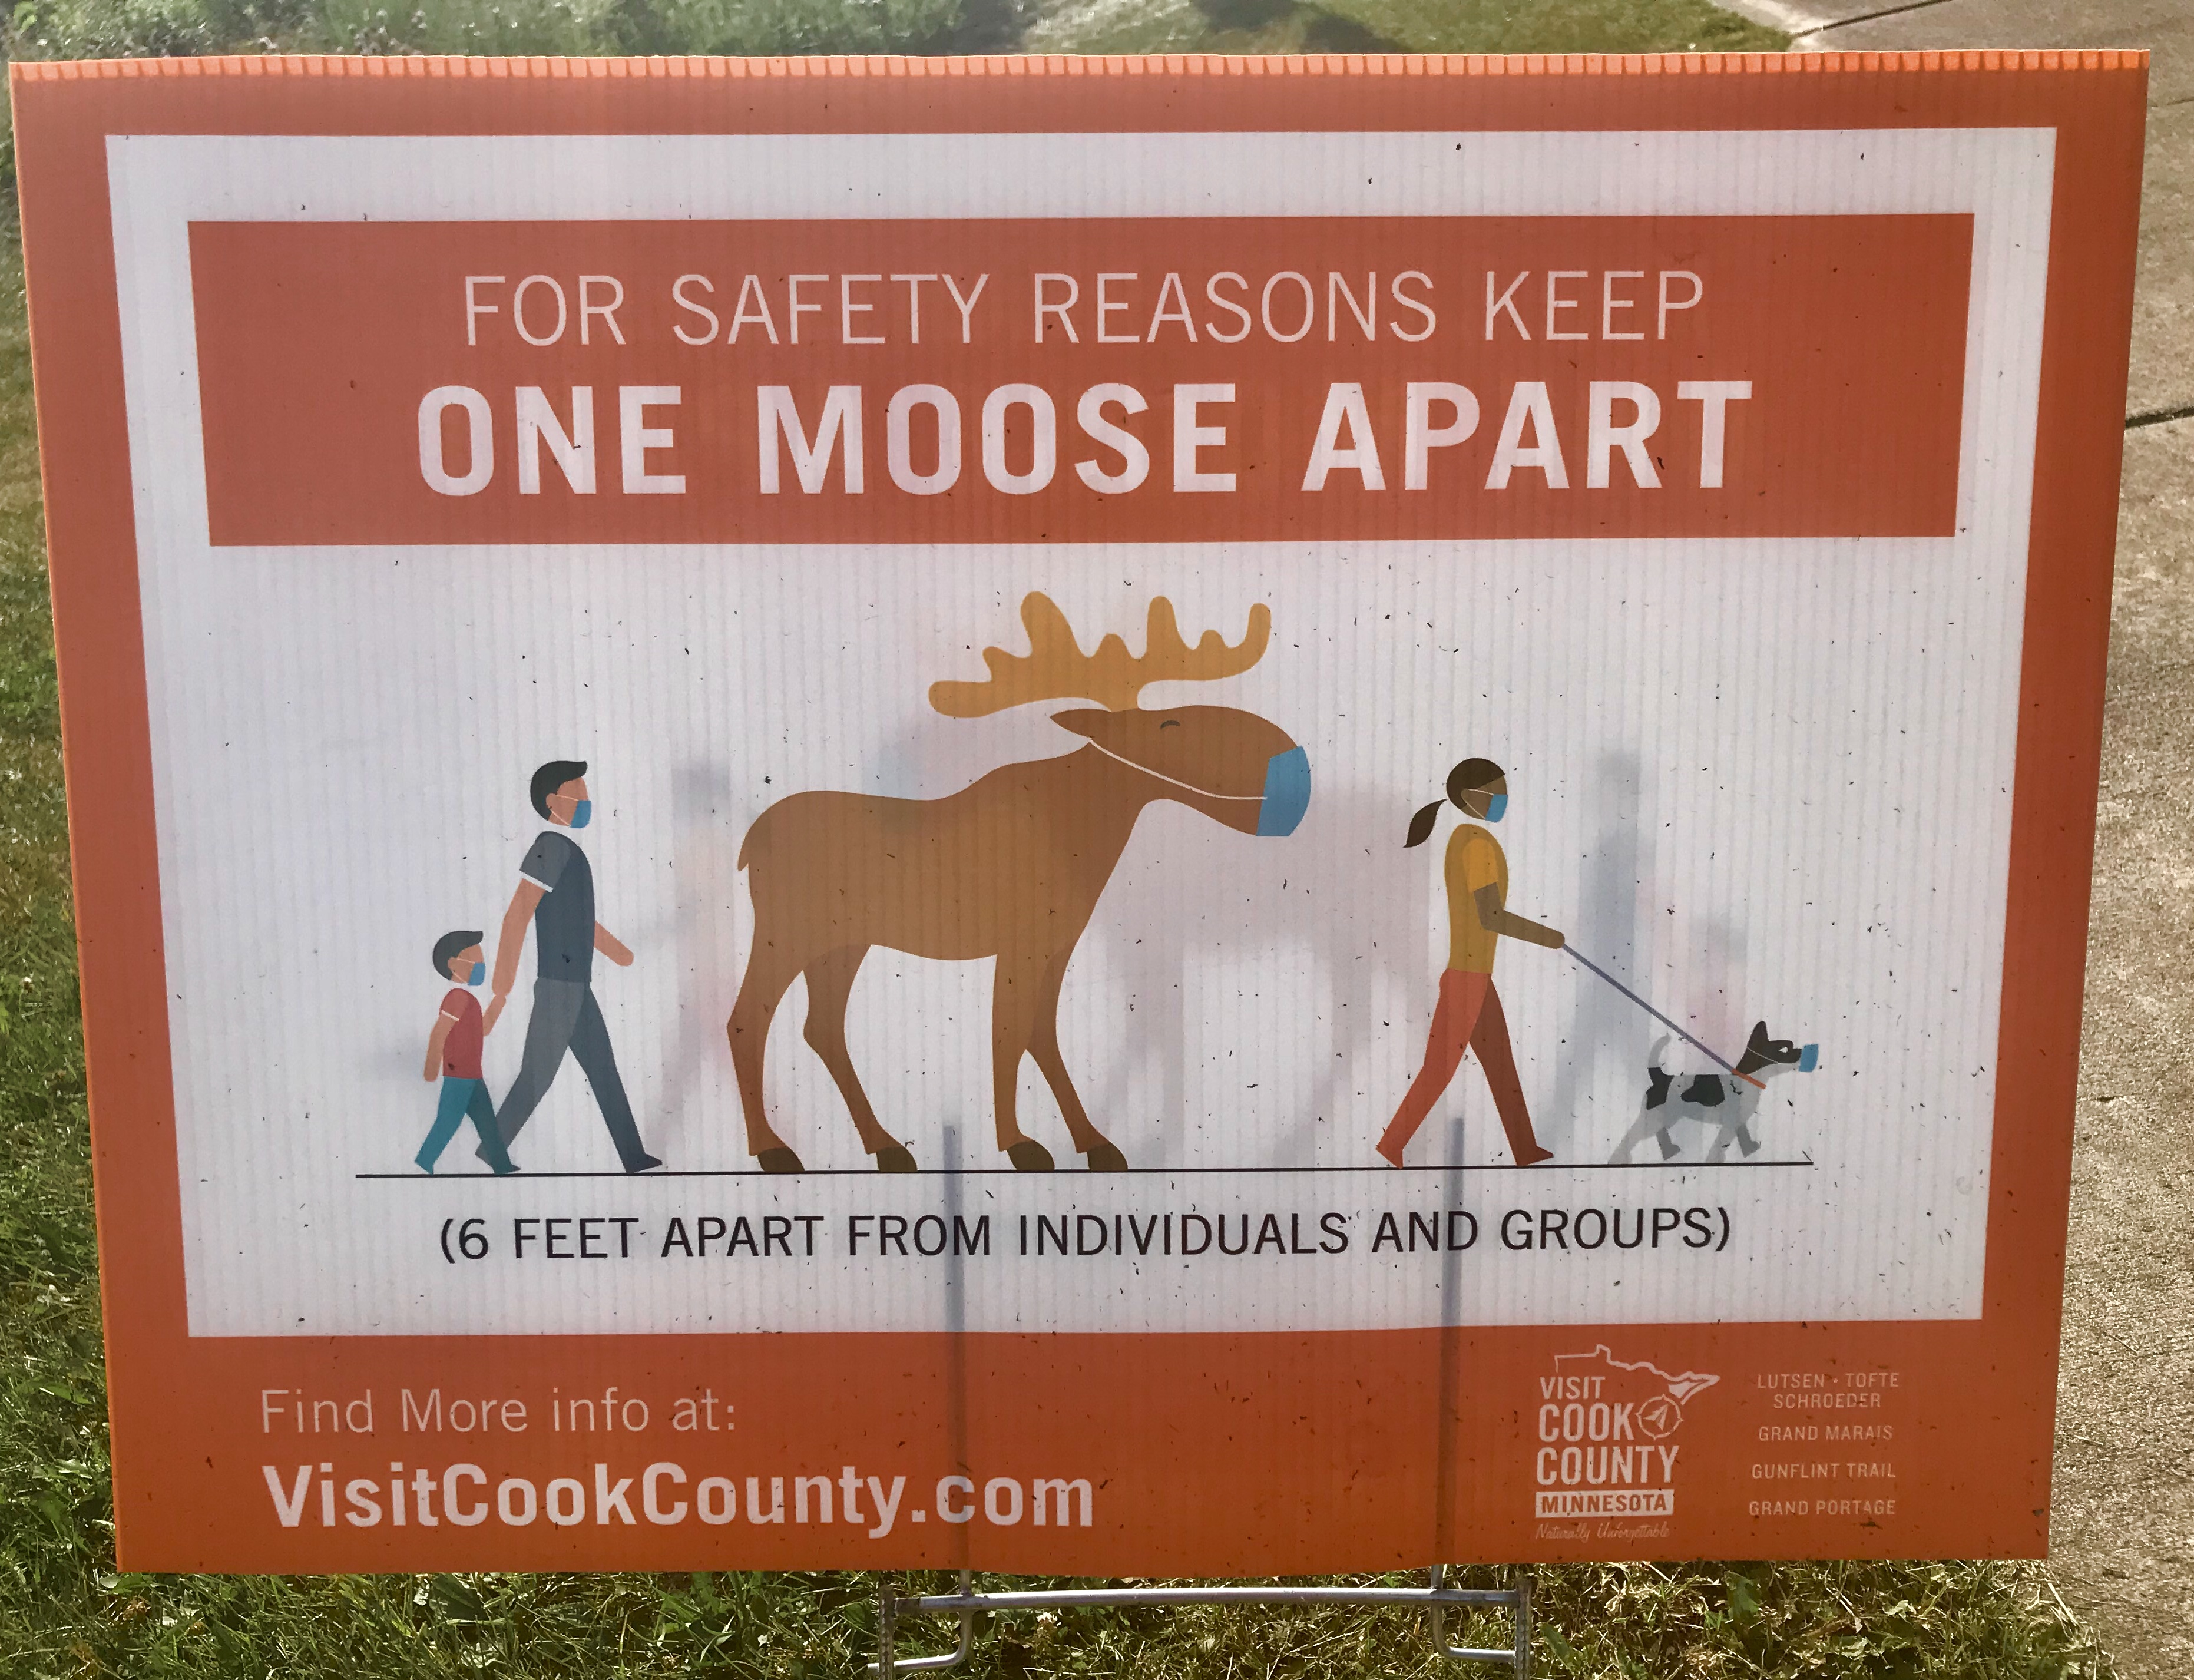 COVID_One Moose Apart